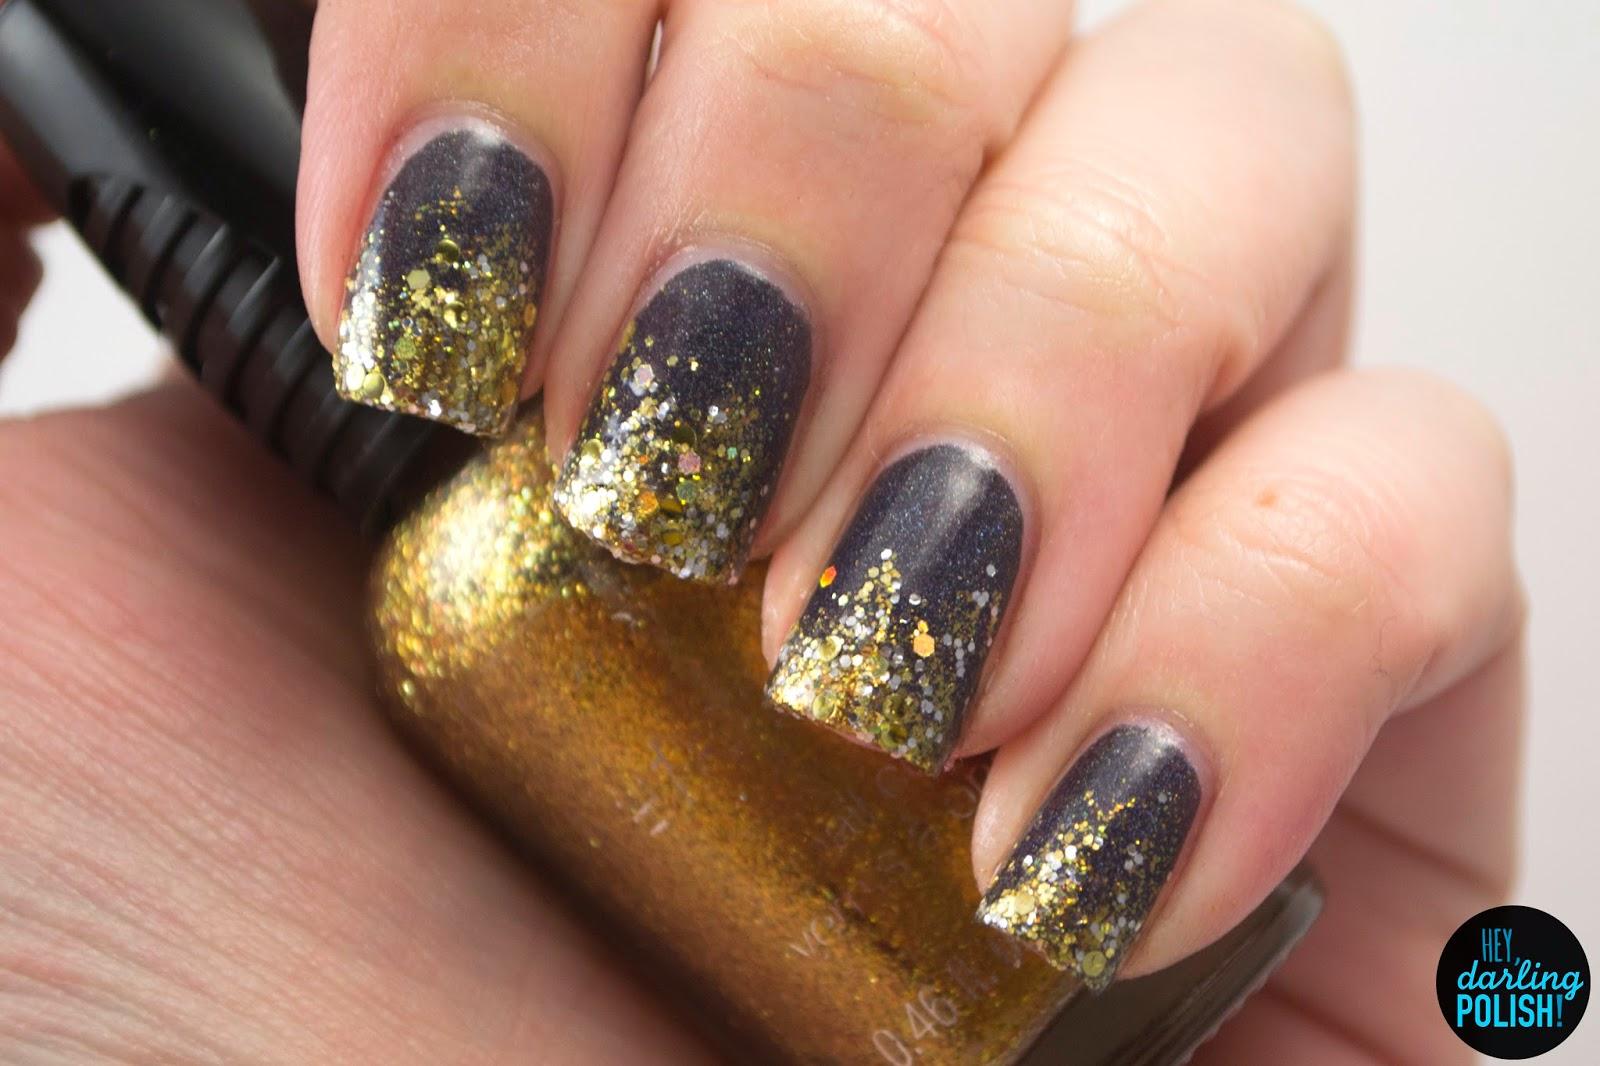 nails, nail polish, polish, indie, indie polish, indie nail polish, glitter, gold, silver, glitter gradient, holo, lacquer legion, hey darling polish